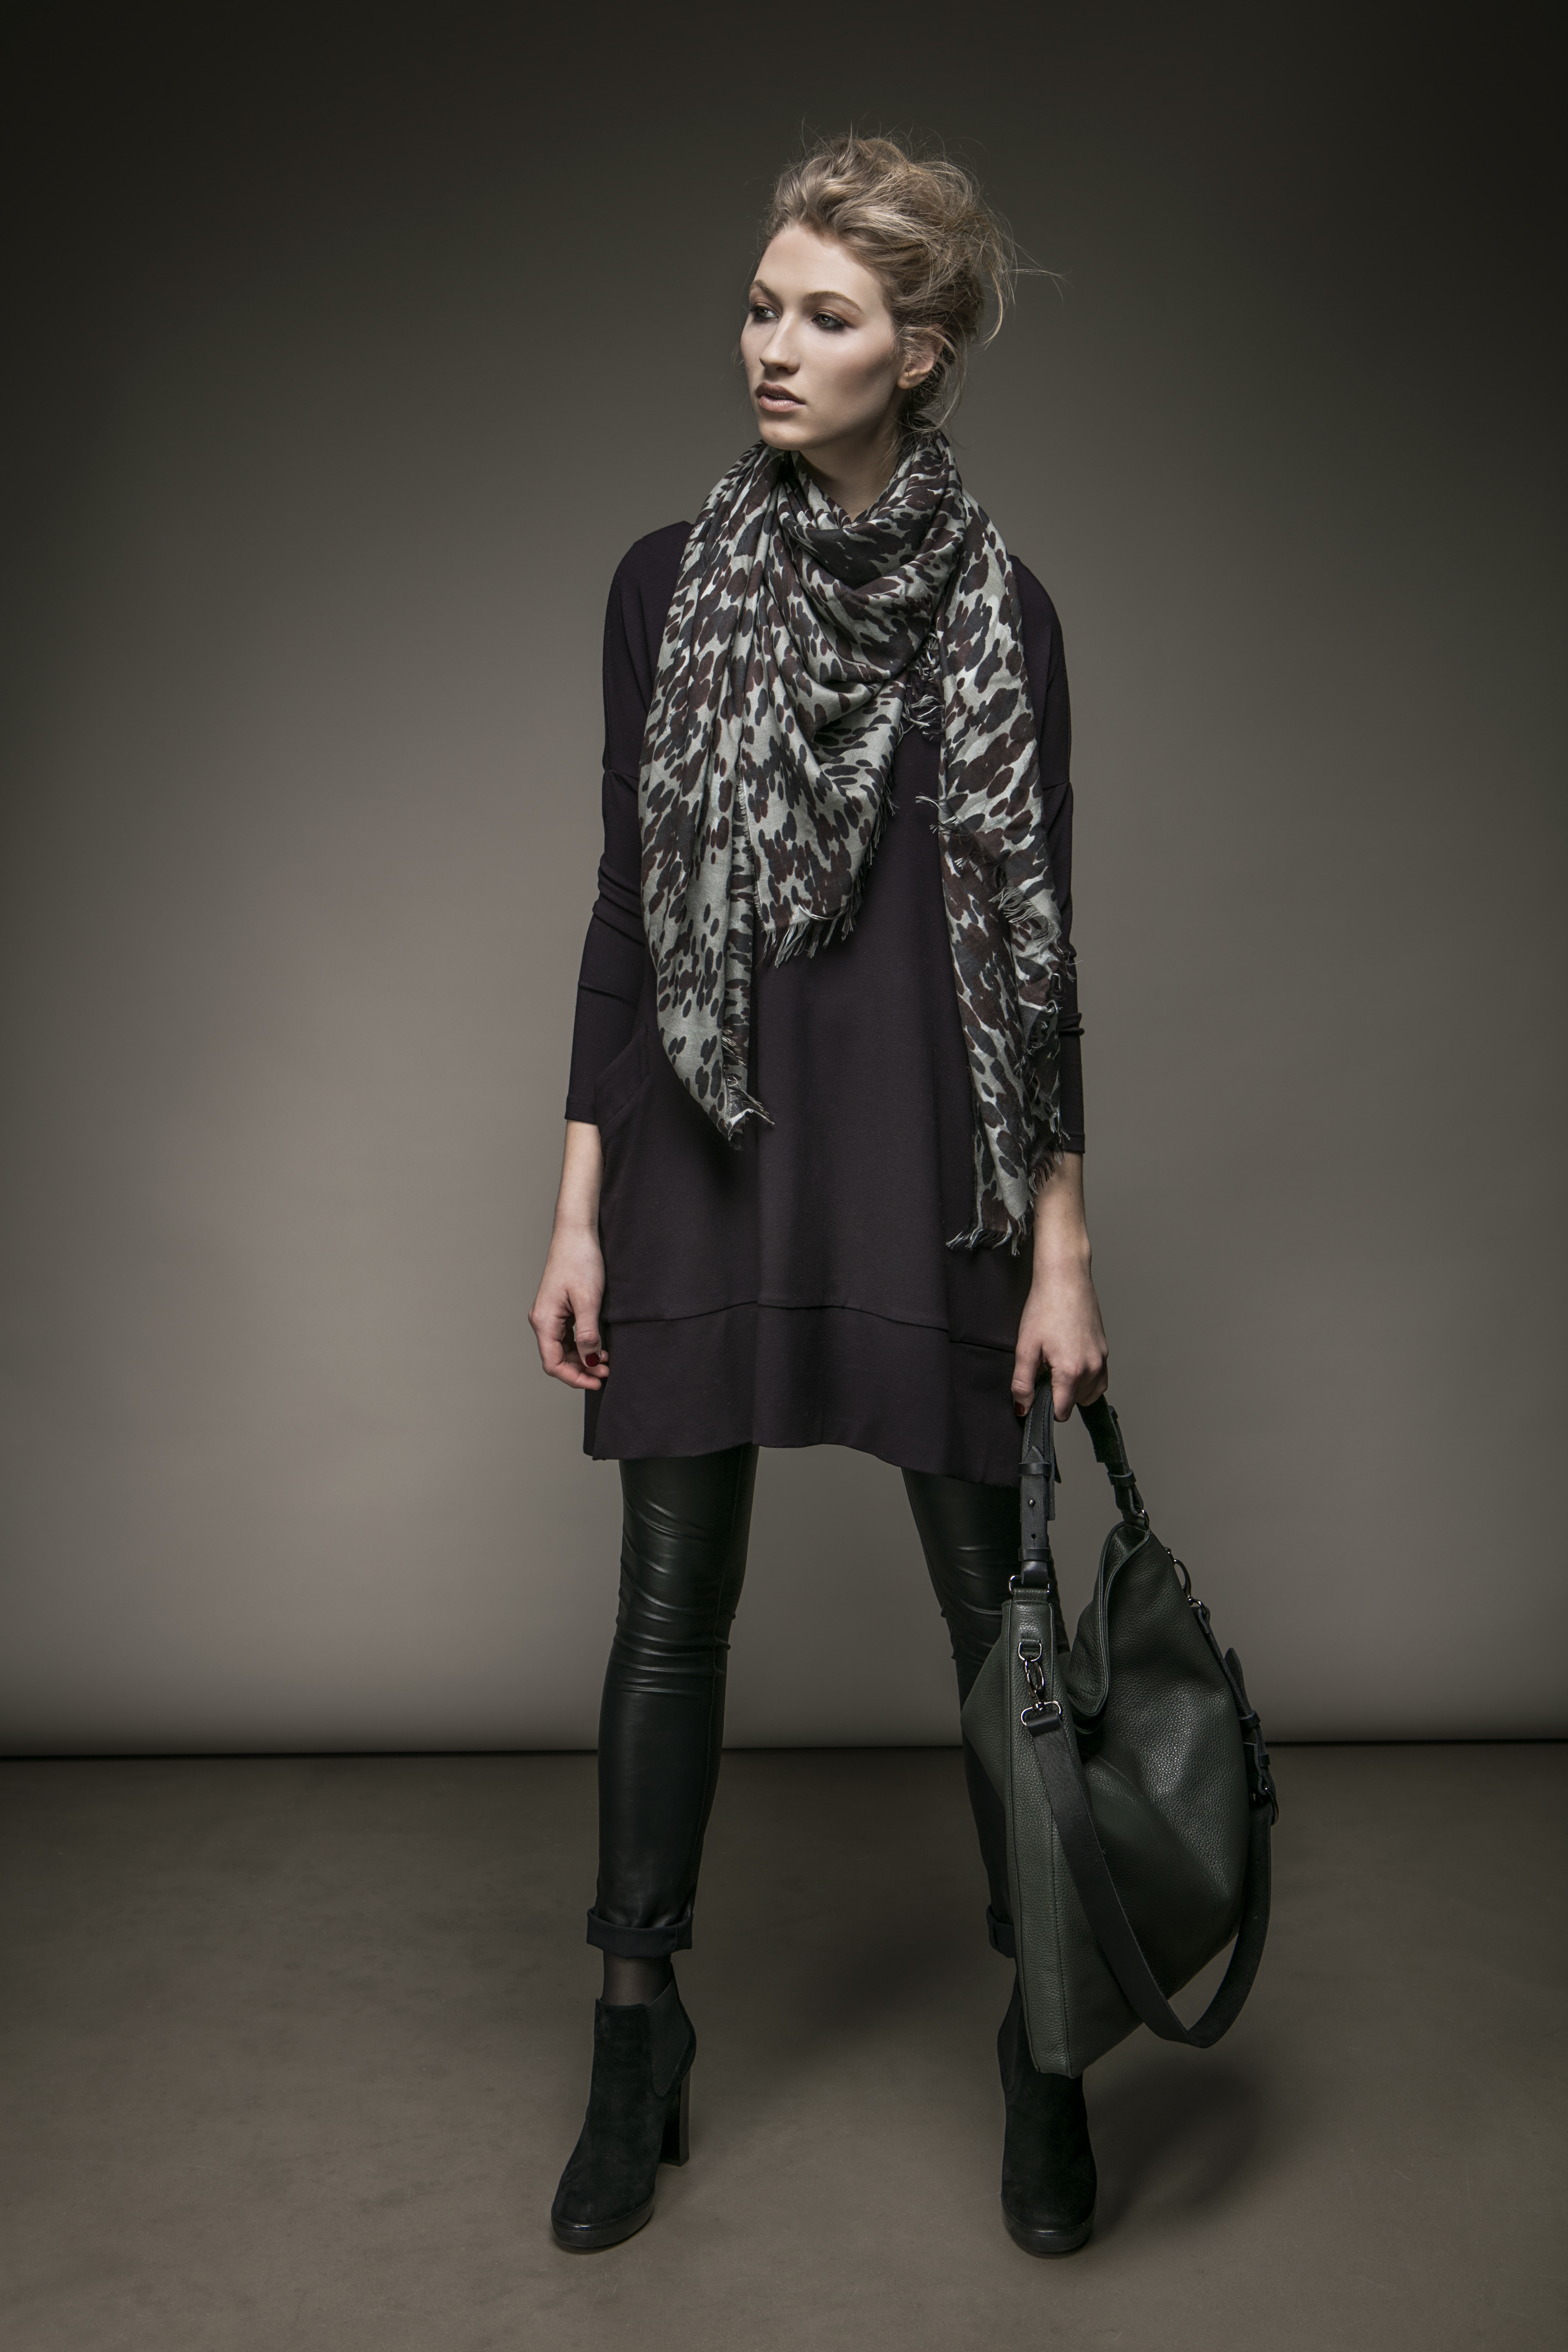 Ob Bluse oder Schal: Hauptsache bedruckt.